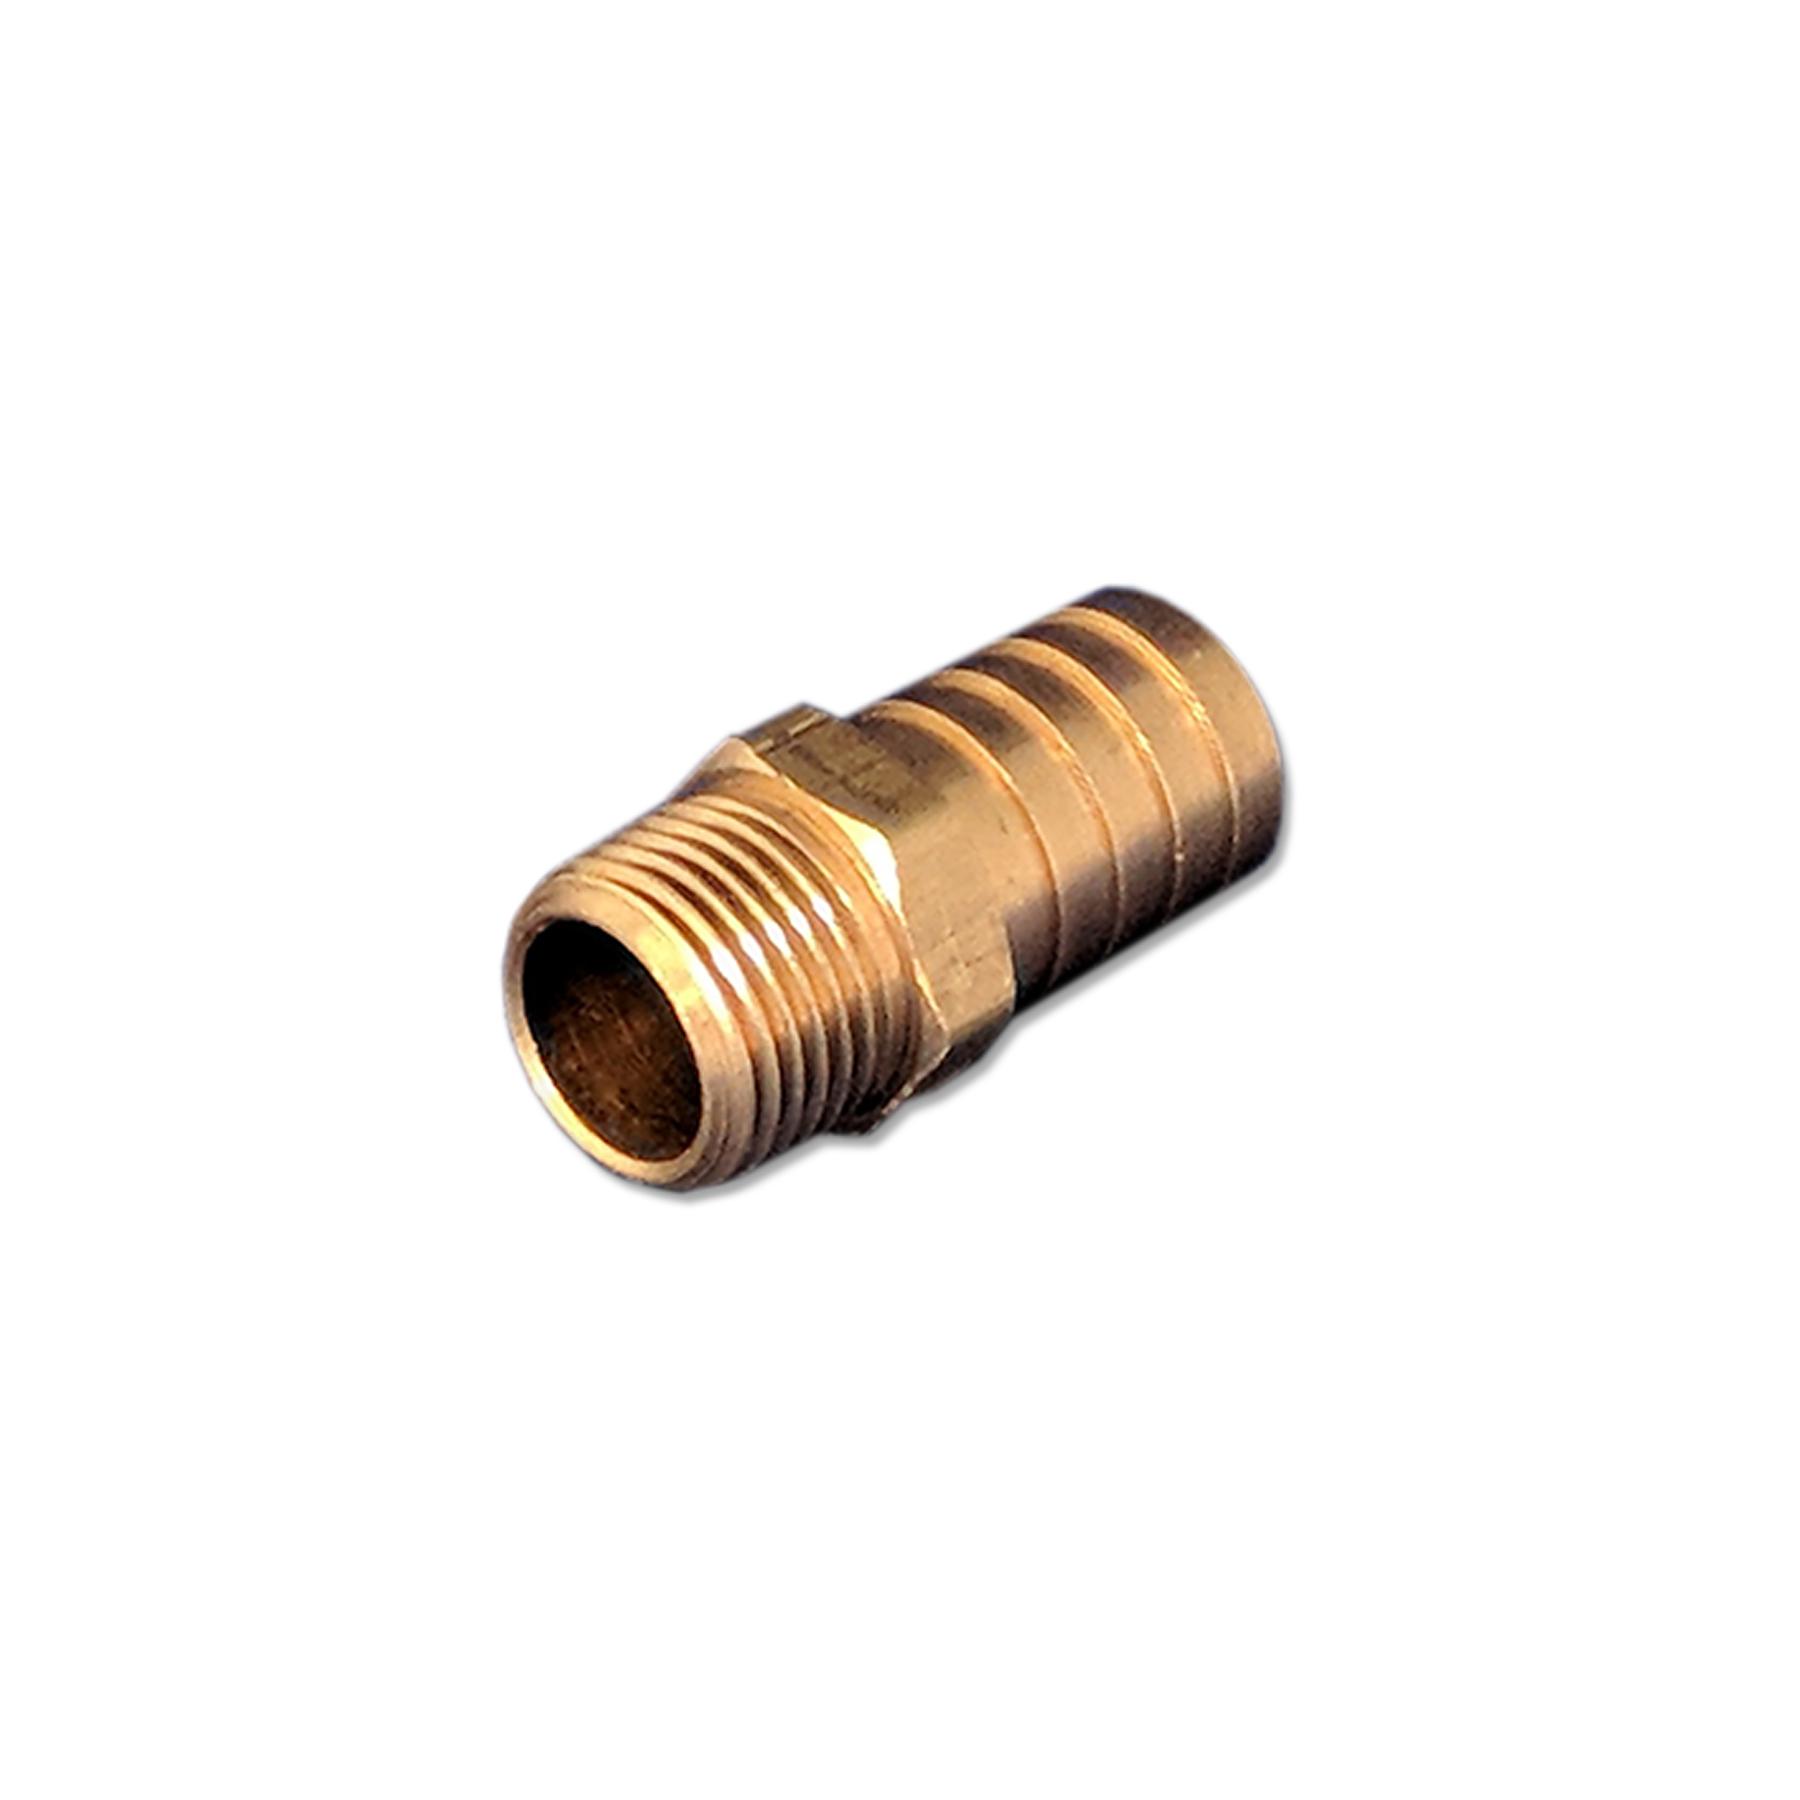 Brass, Barb Fitting  3/4 X 1/2,  (Male) NPT